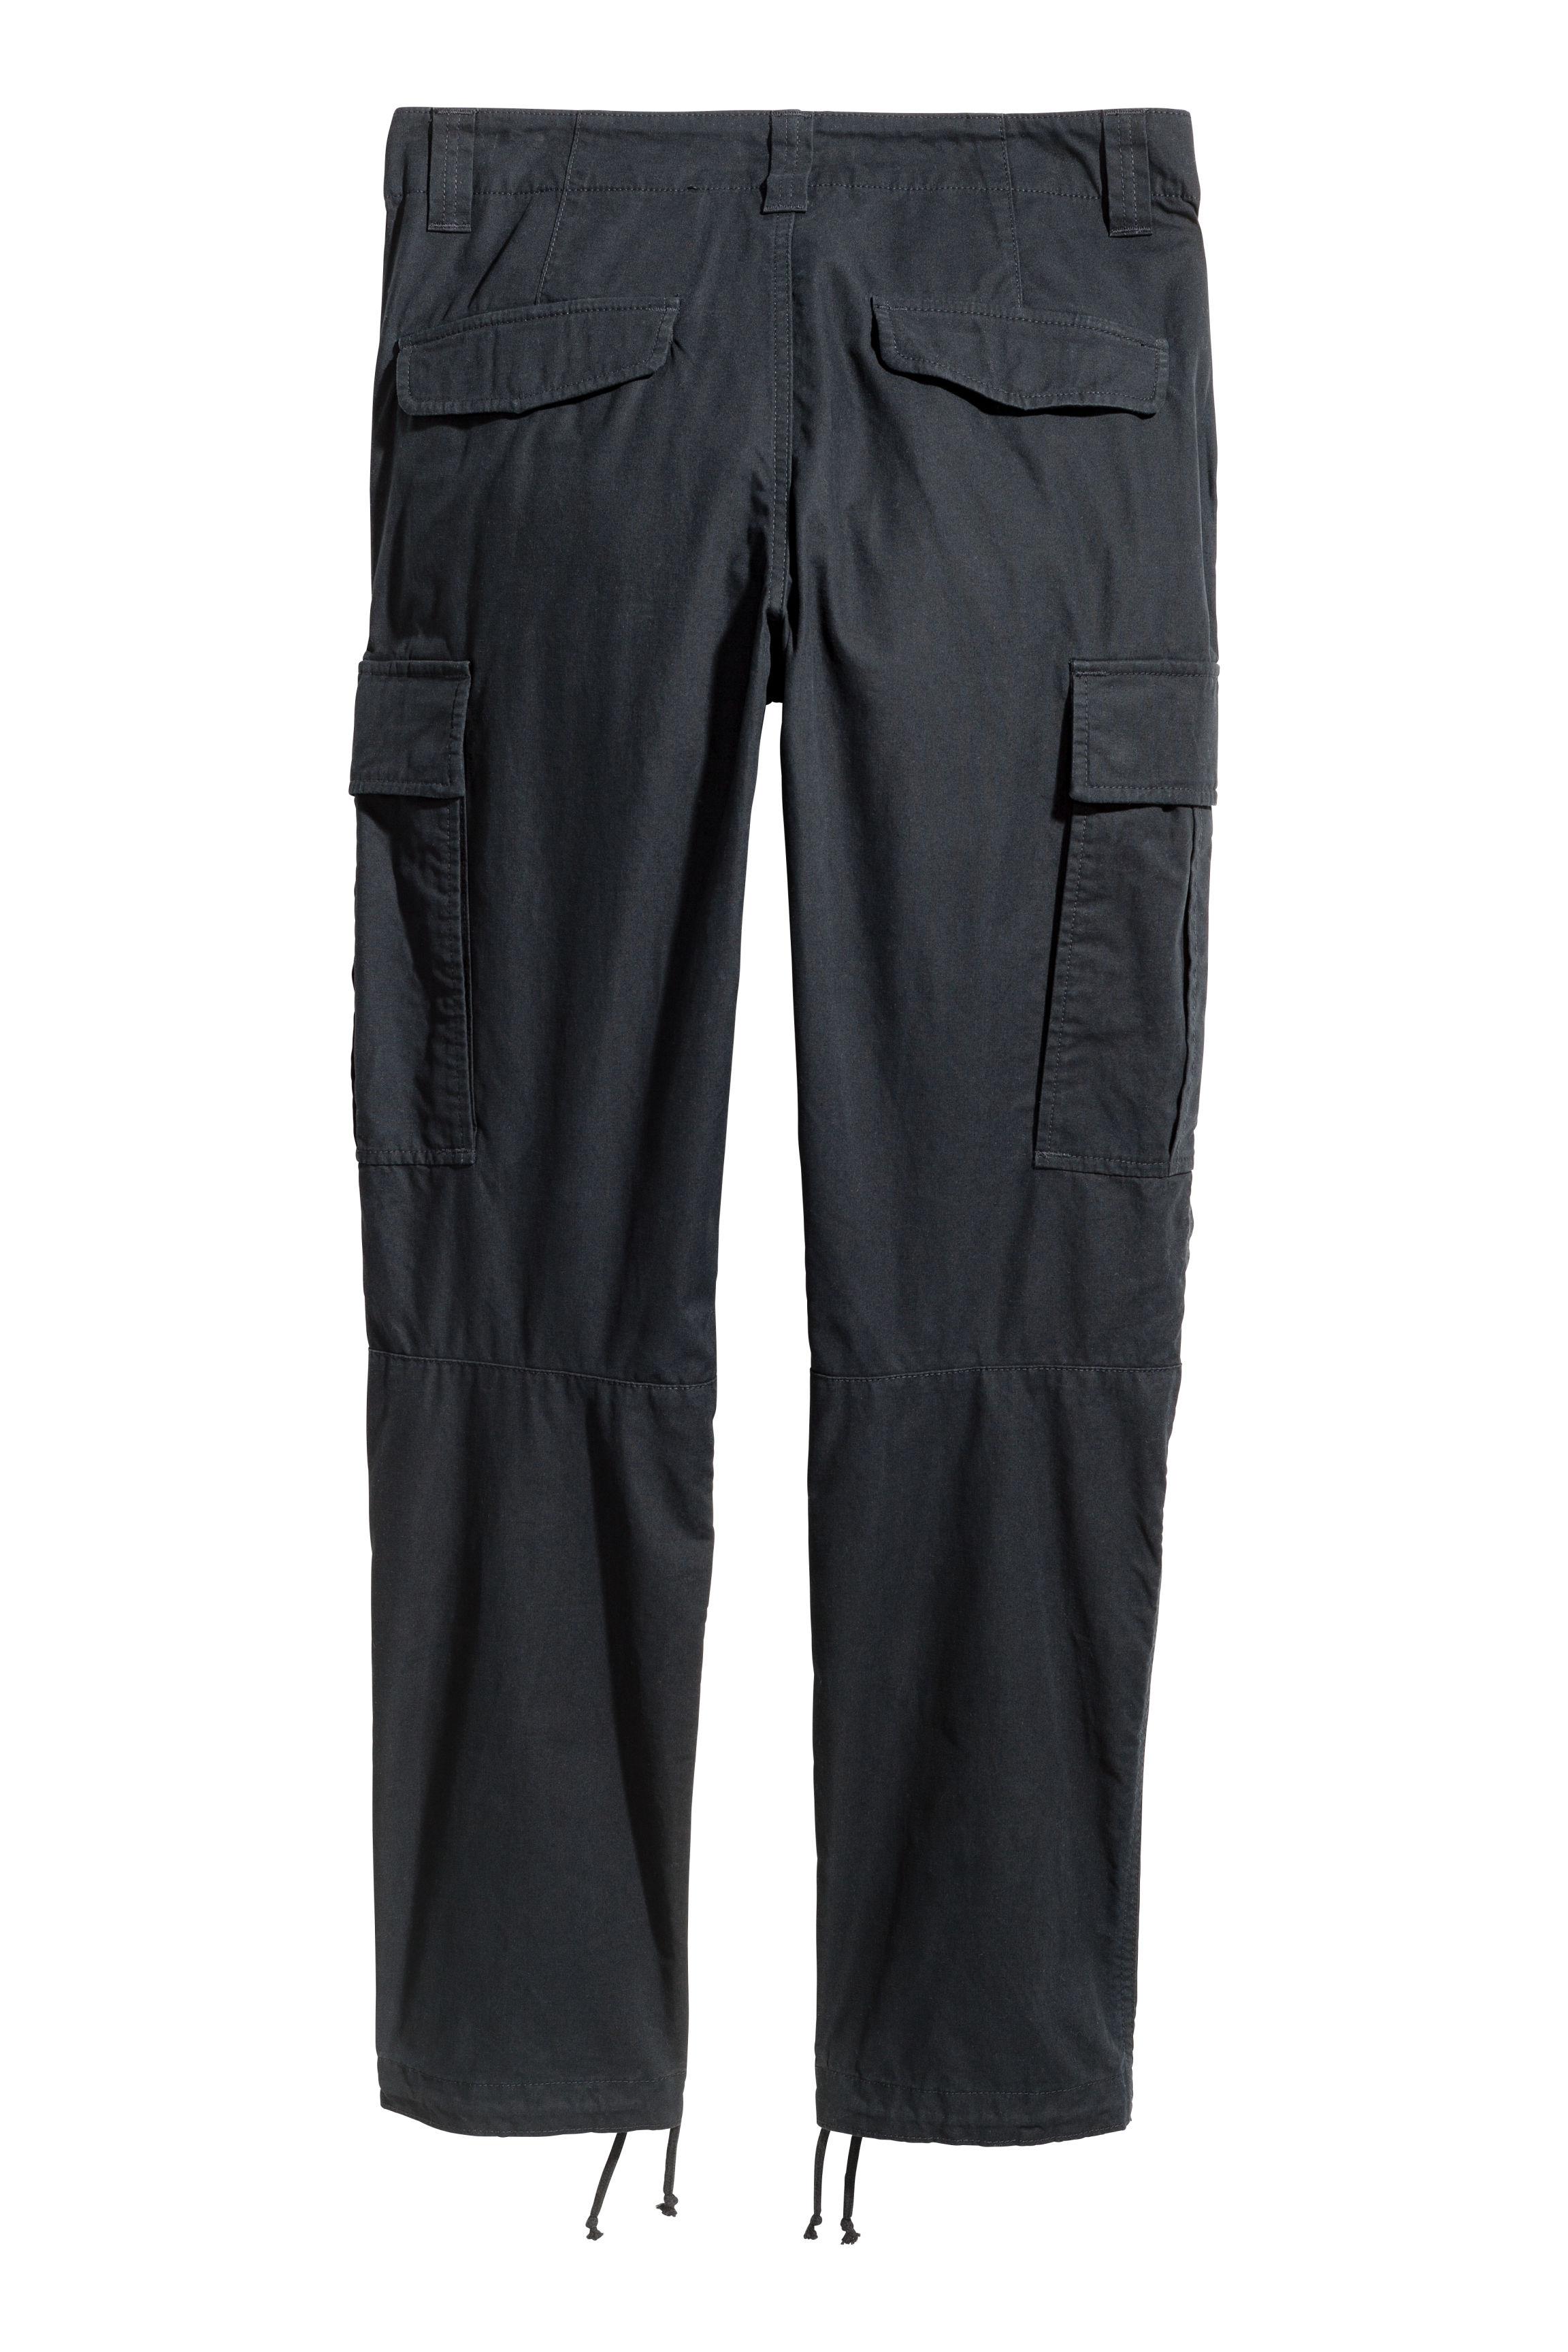 55097b52702 Cargo Pants - Black - Men